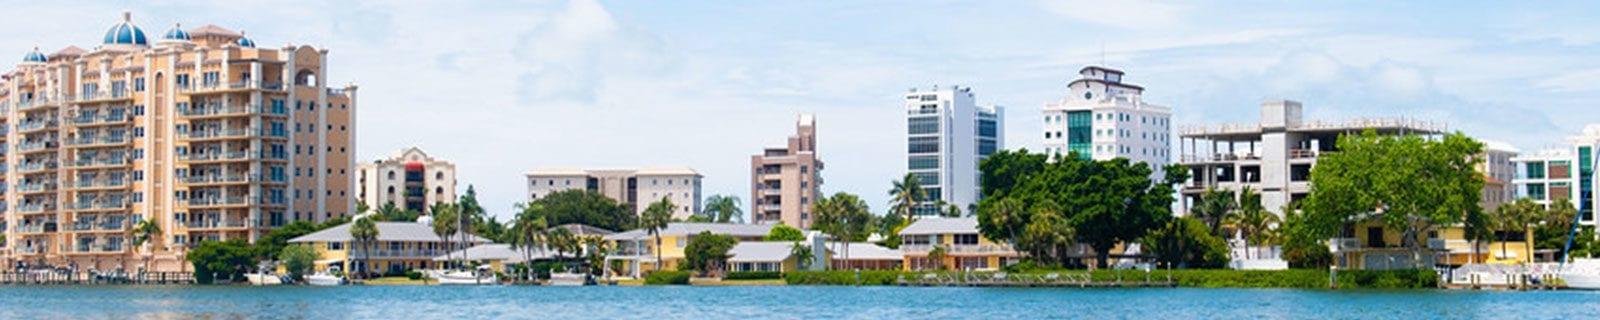 Sarasota skyline from water